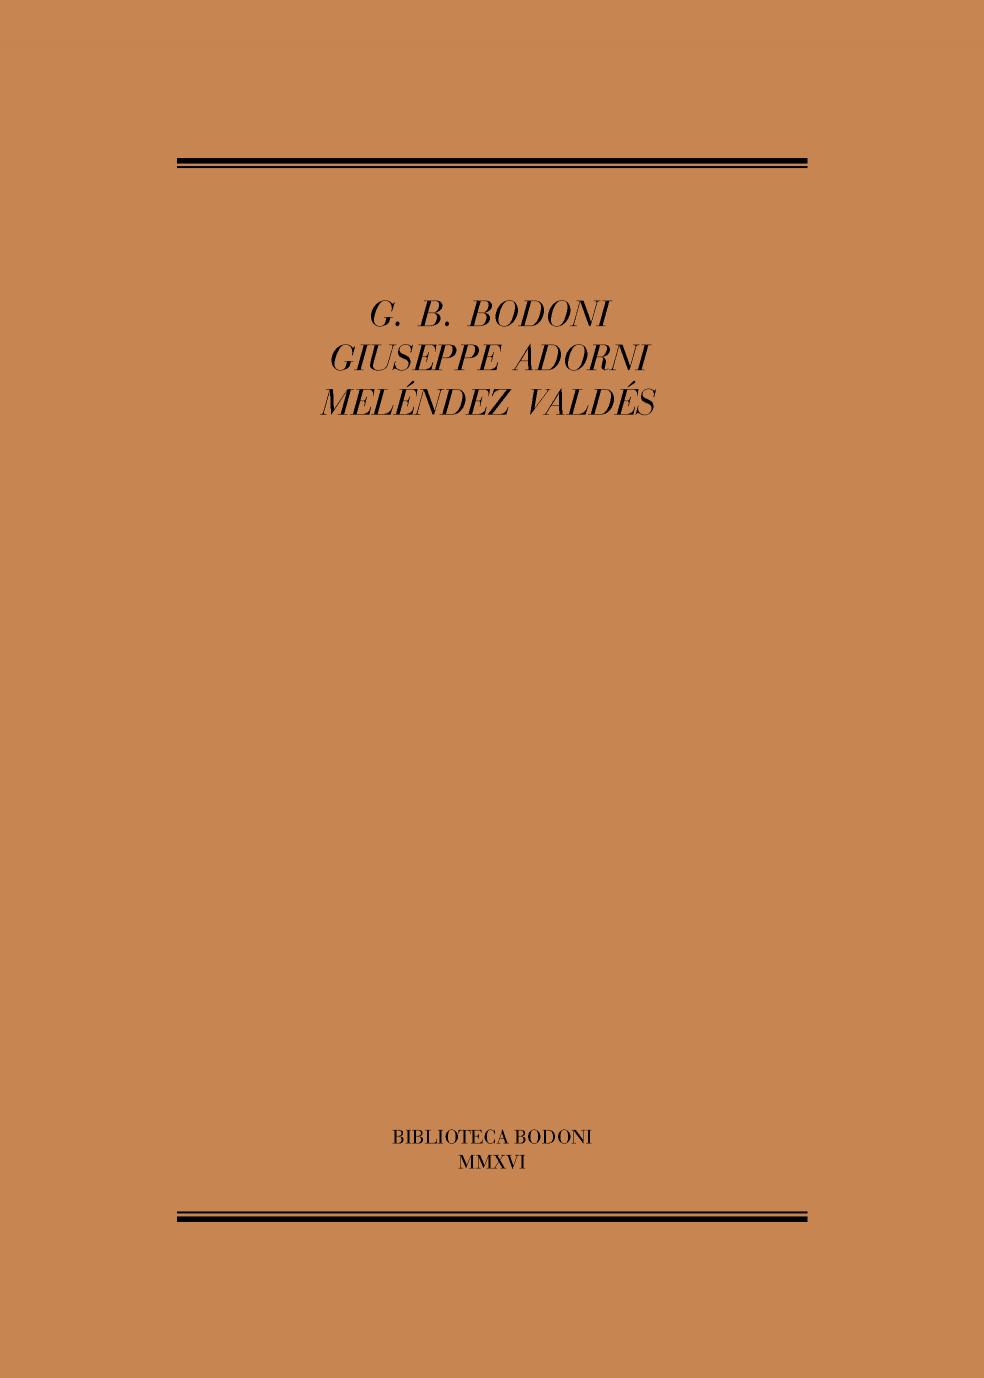 G. B. Bodoni, Giuseppe Adorni, Meléndez Valdés